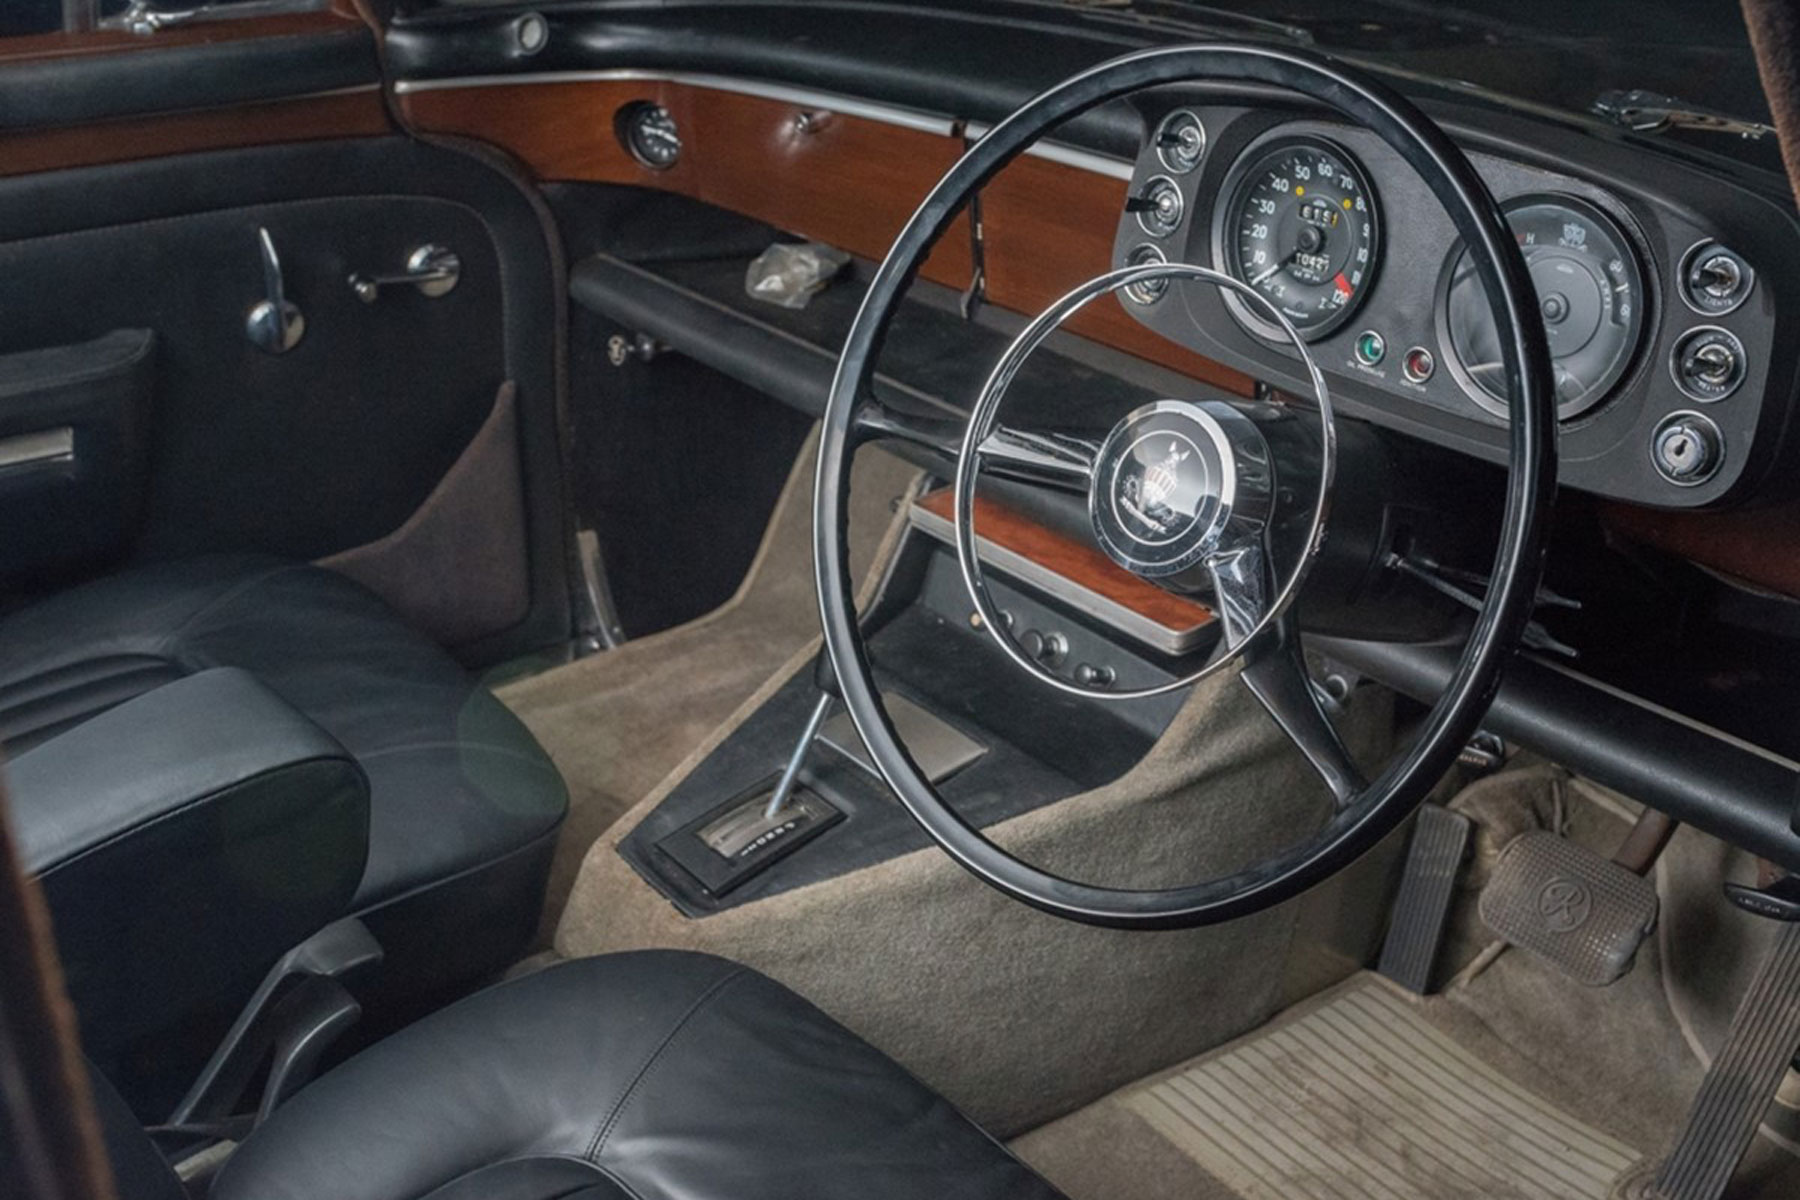 Rover P5B interior